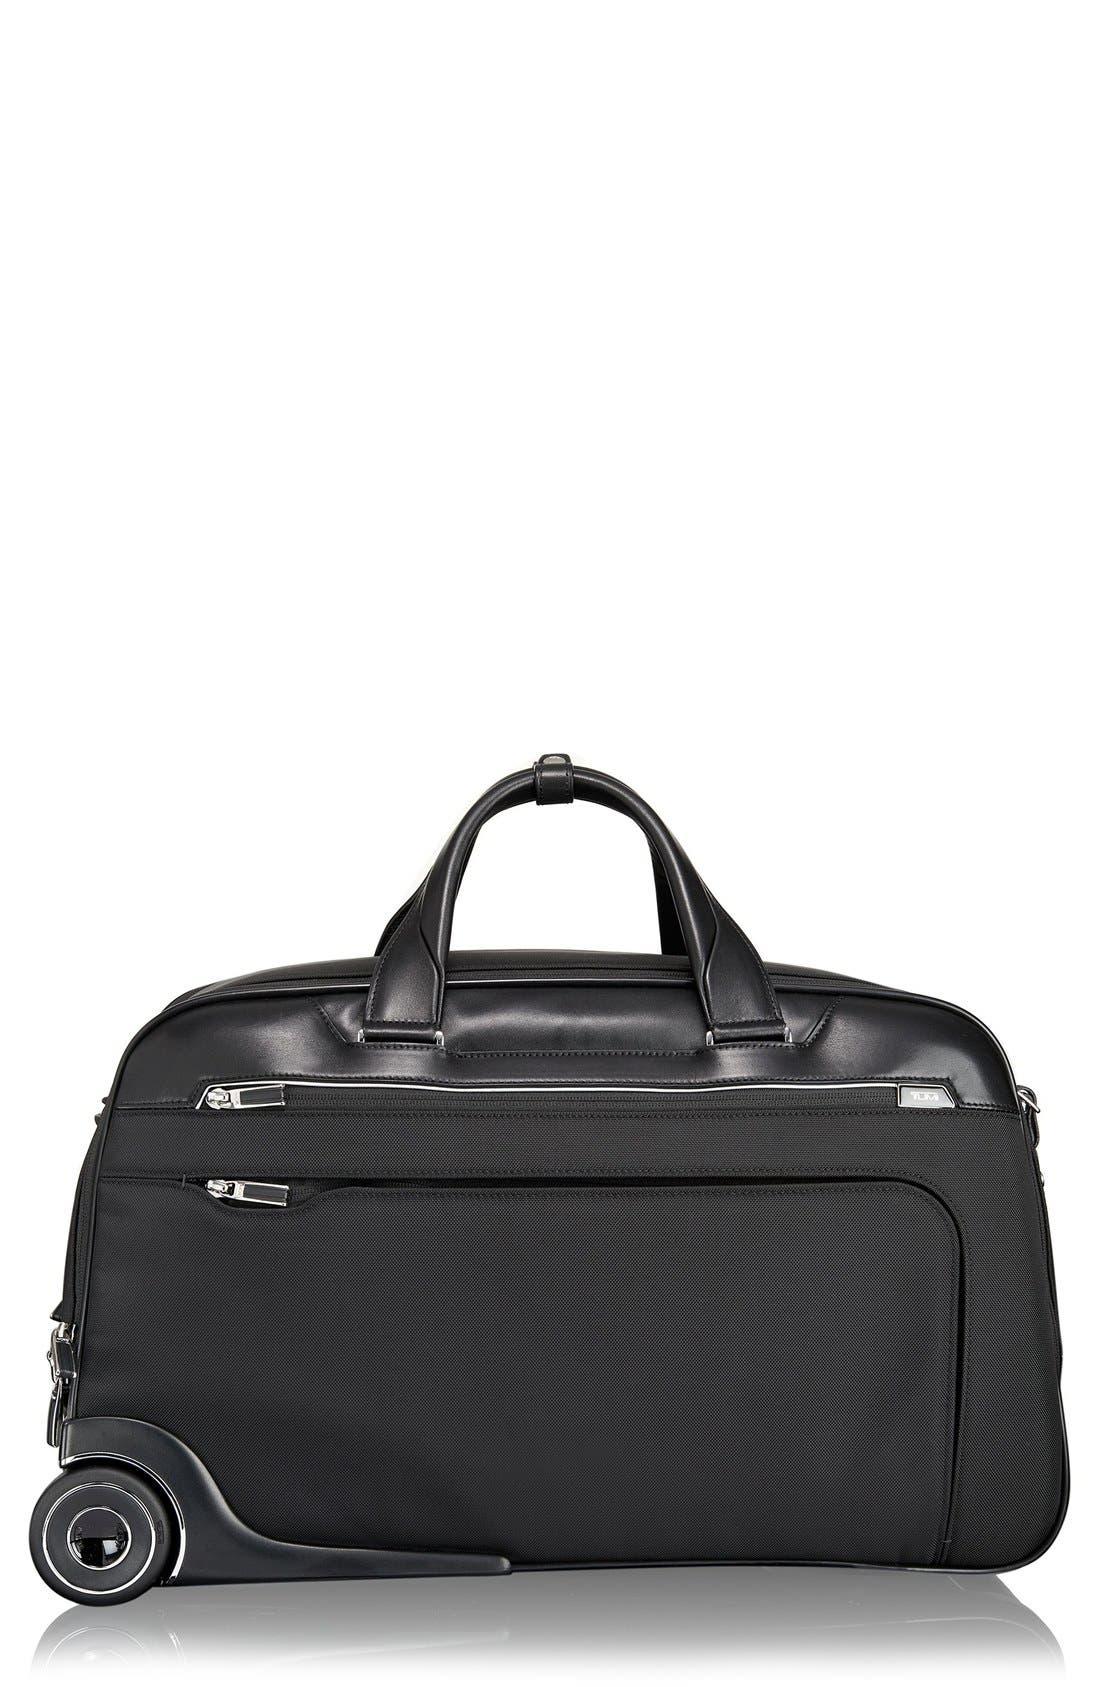 Tumi 'Arrivé - Rockford' Wheeled Duffel Bag (22 inch)